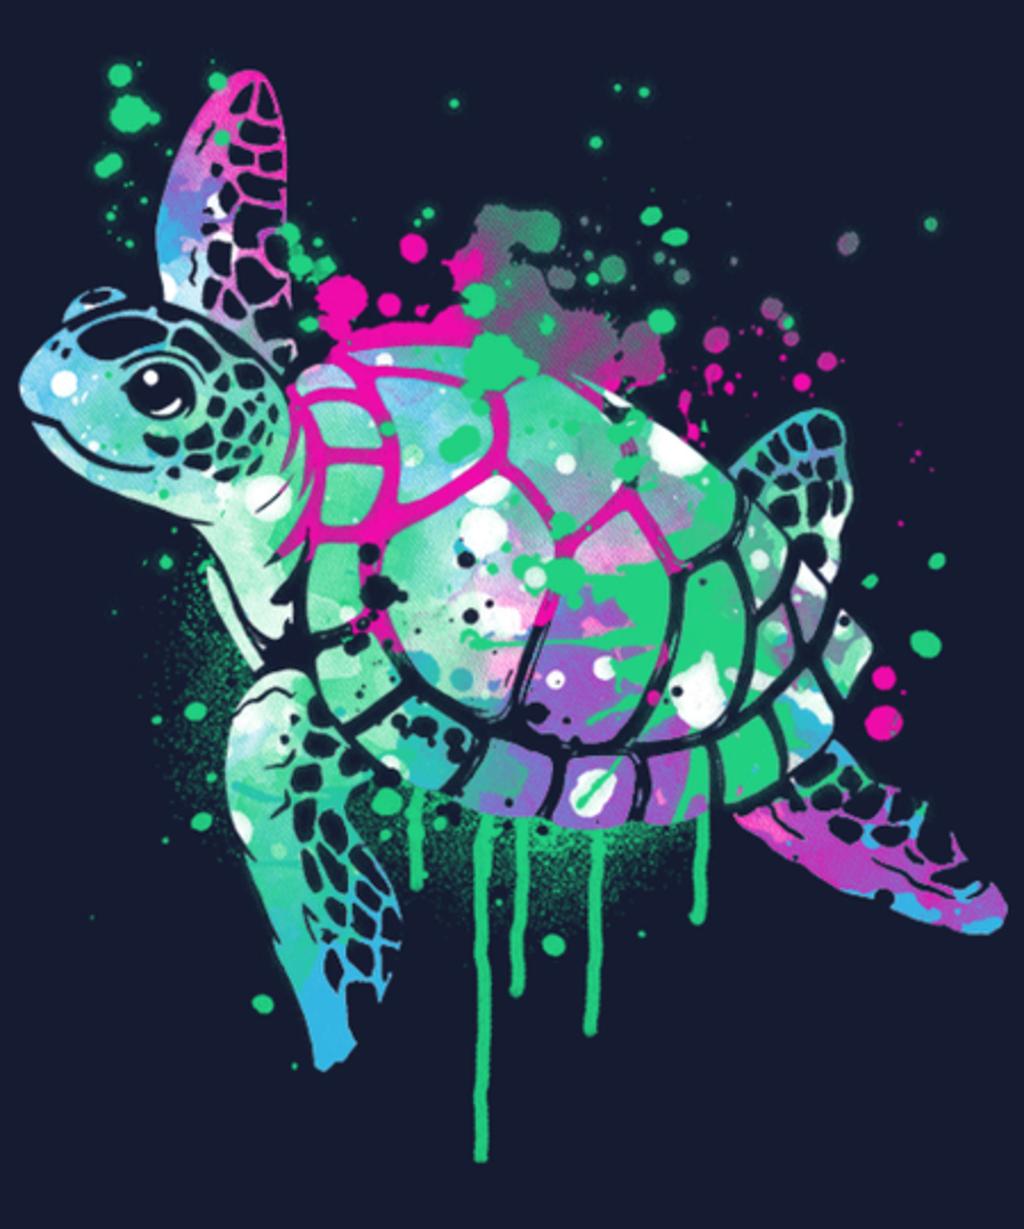 Qwertee: Fluo sea turtle